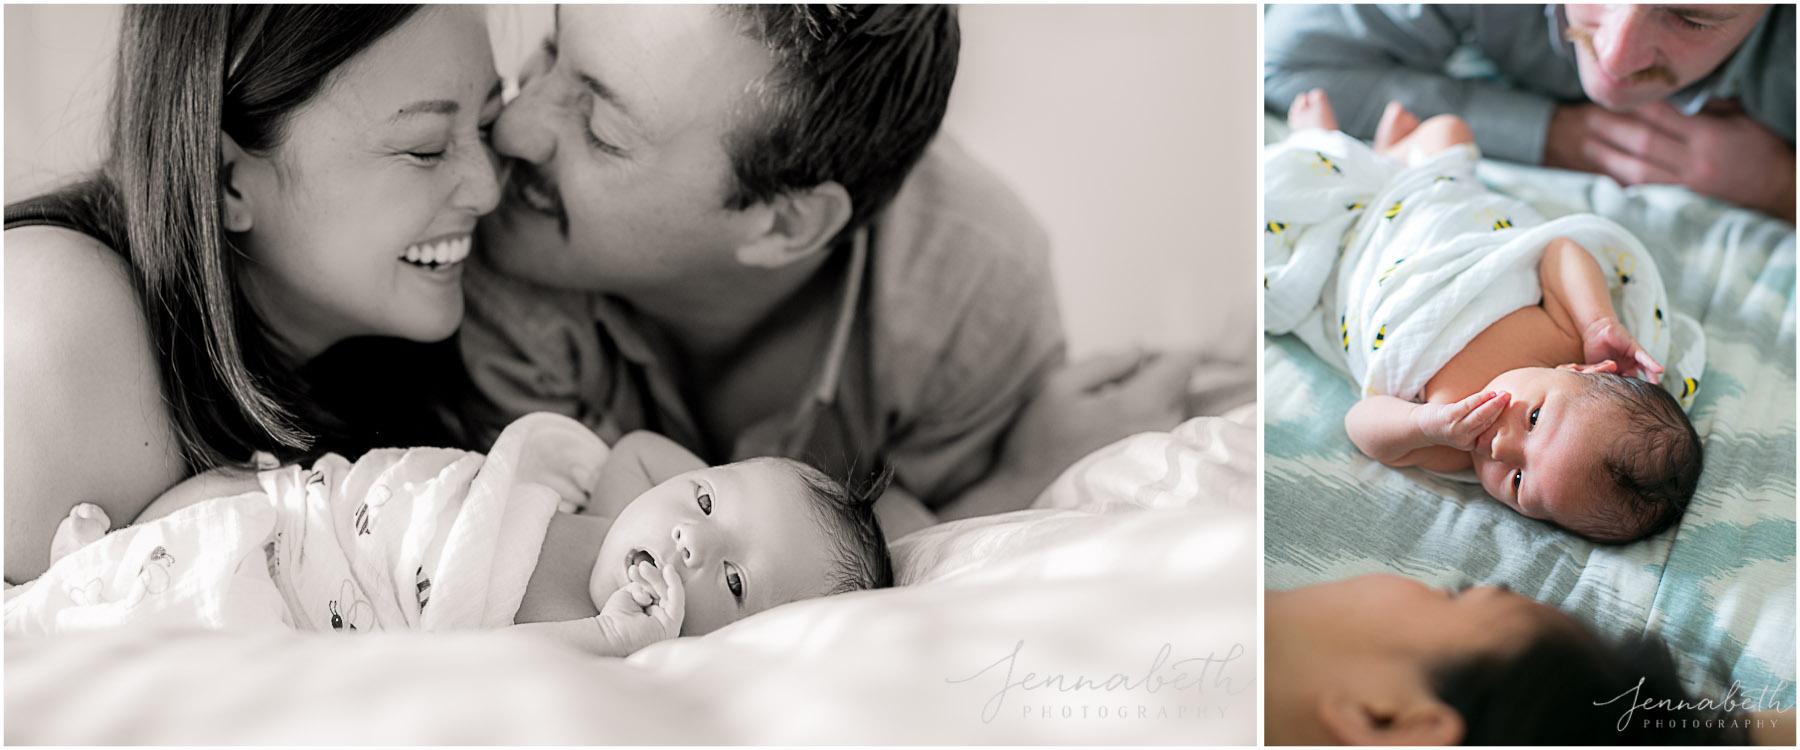 JennaBethPhotography-Quinlan-1.jpg